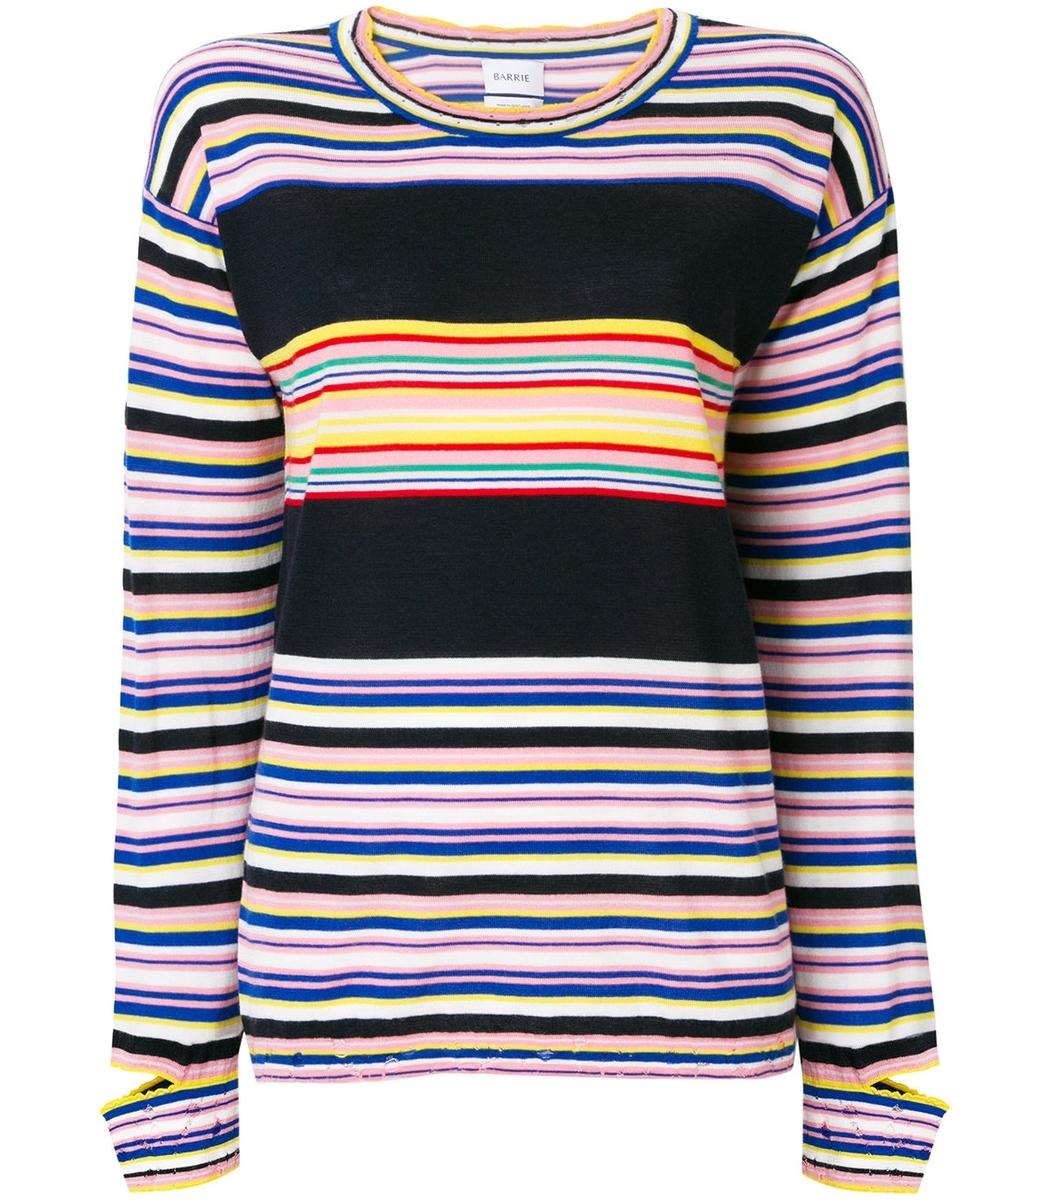 Barrie Multicolor Striped Fine Knit Sweater